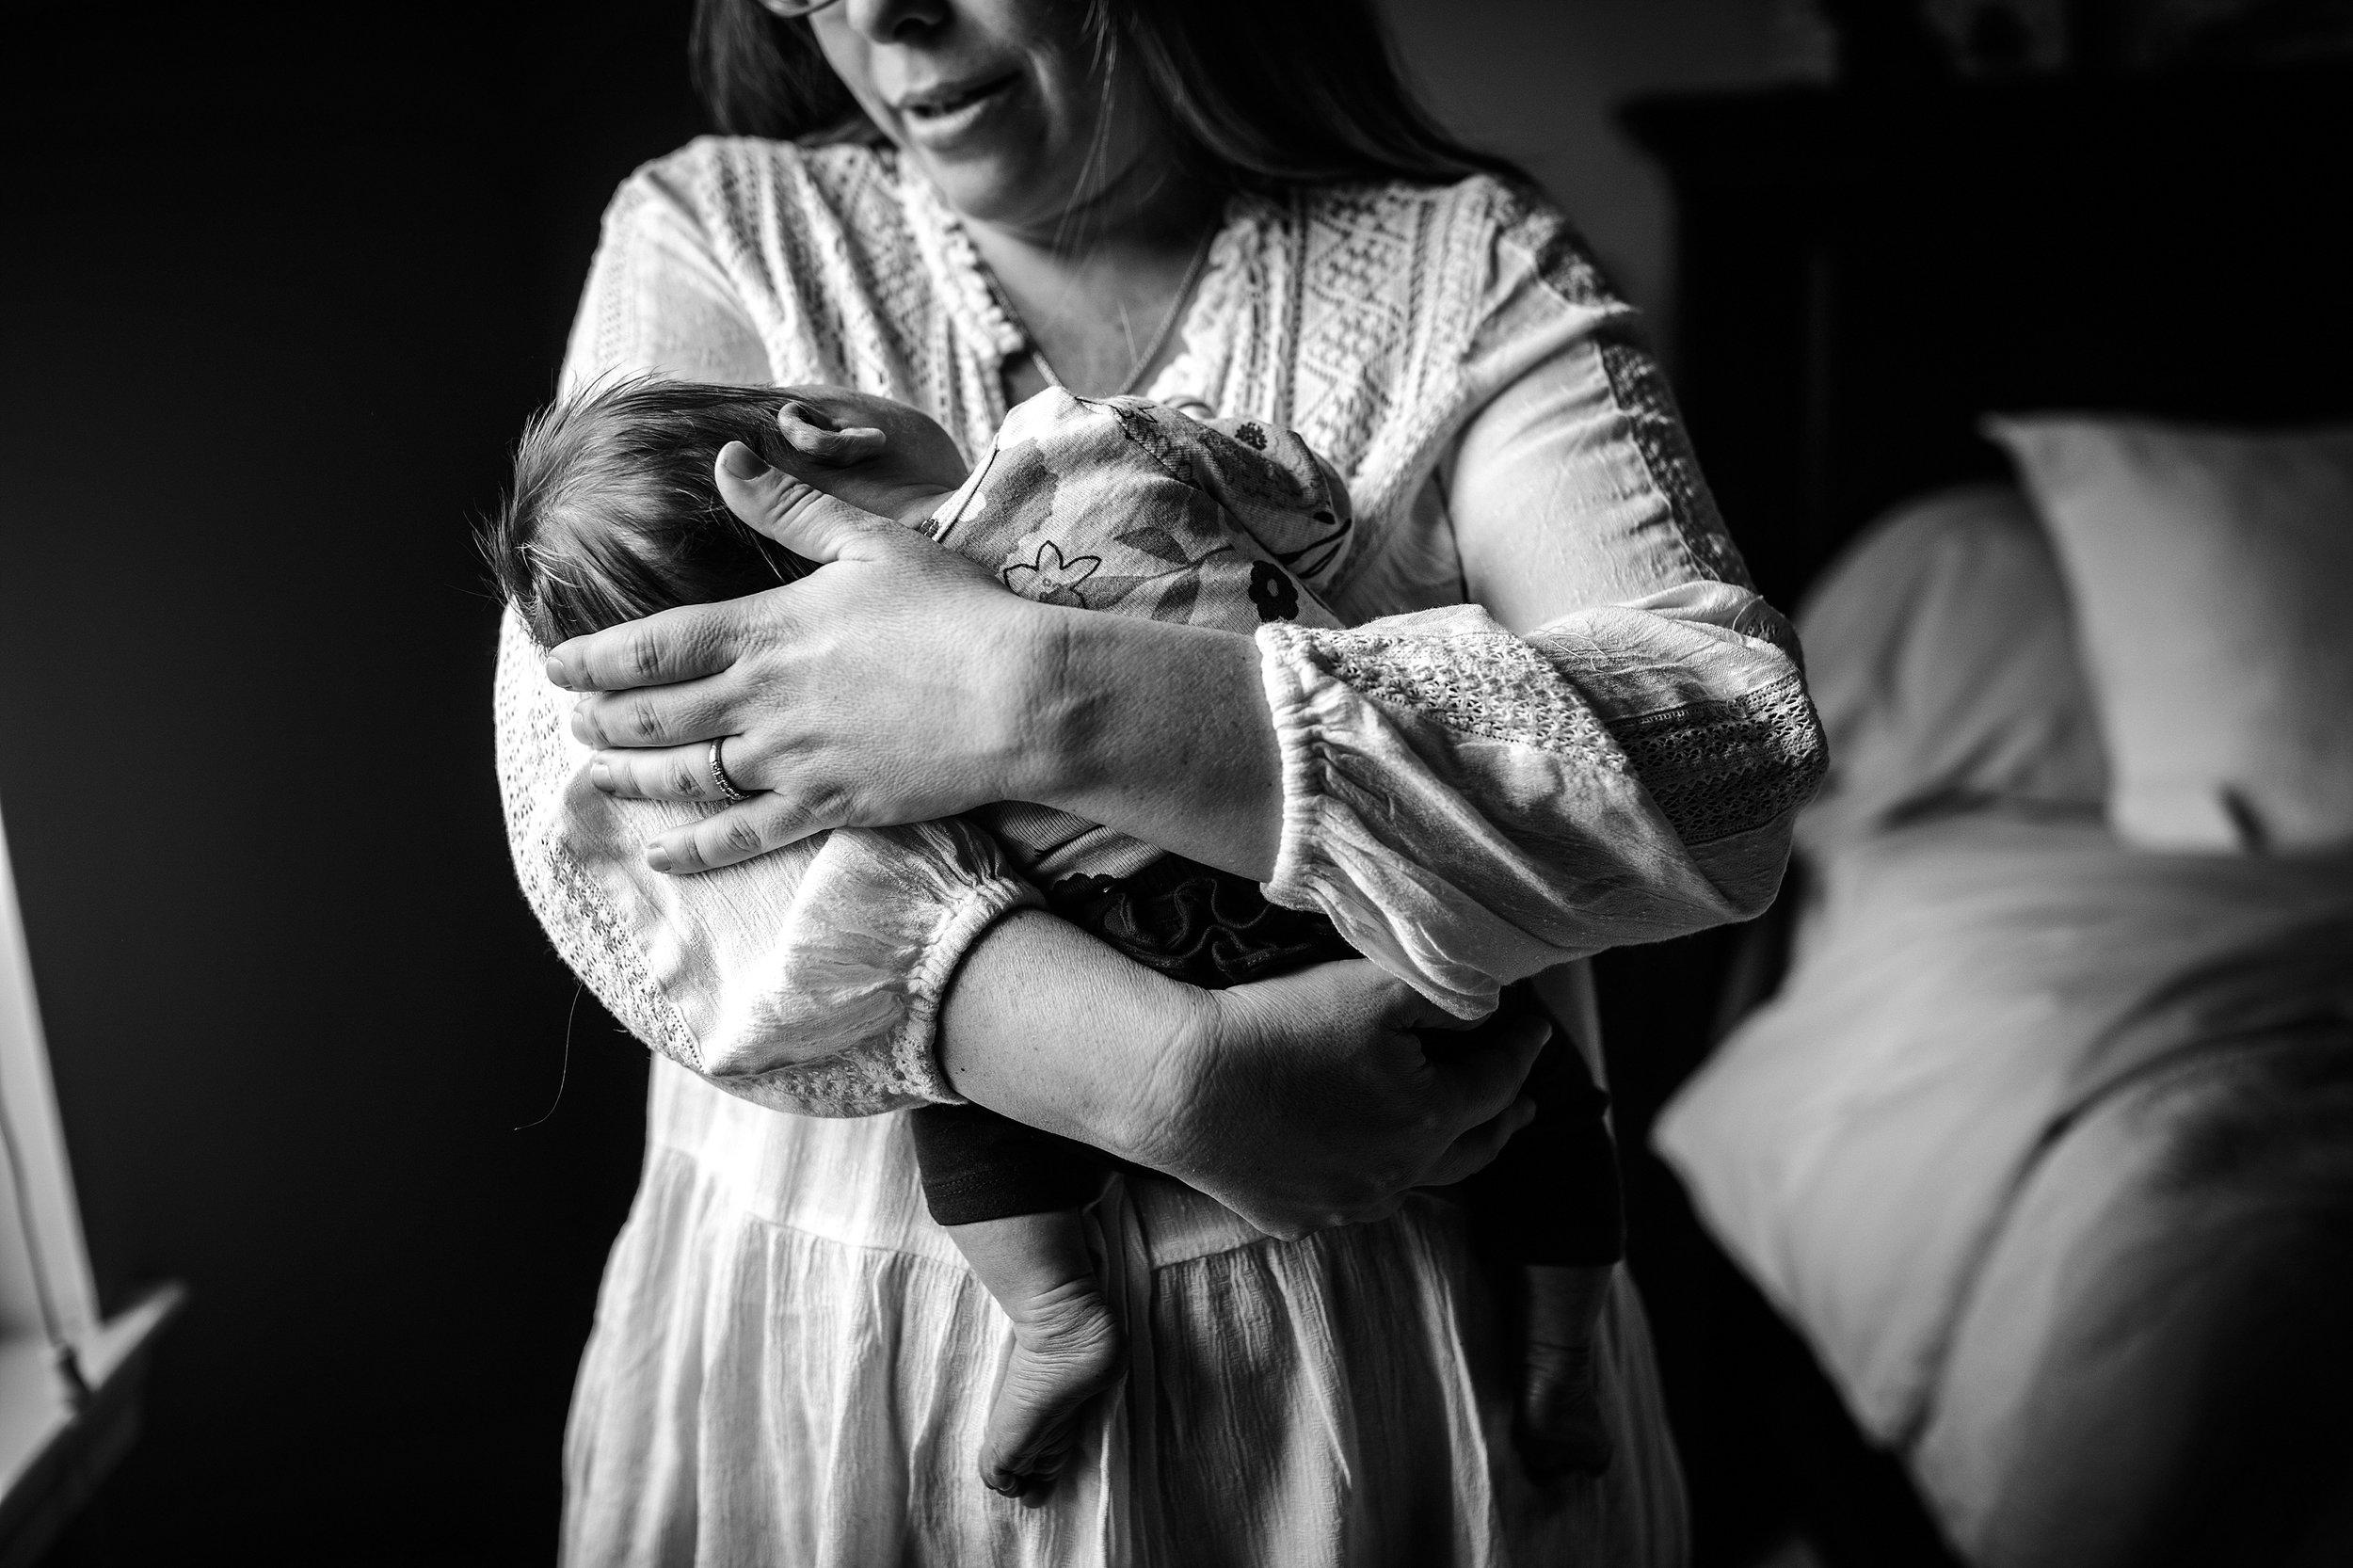 Lehigh-Valley-Newborn-Photographer_0029.jpg